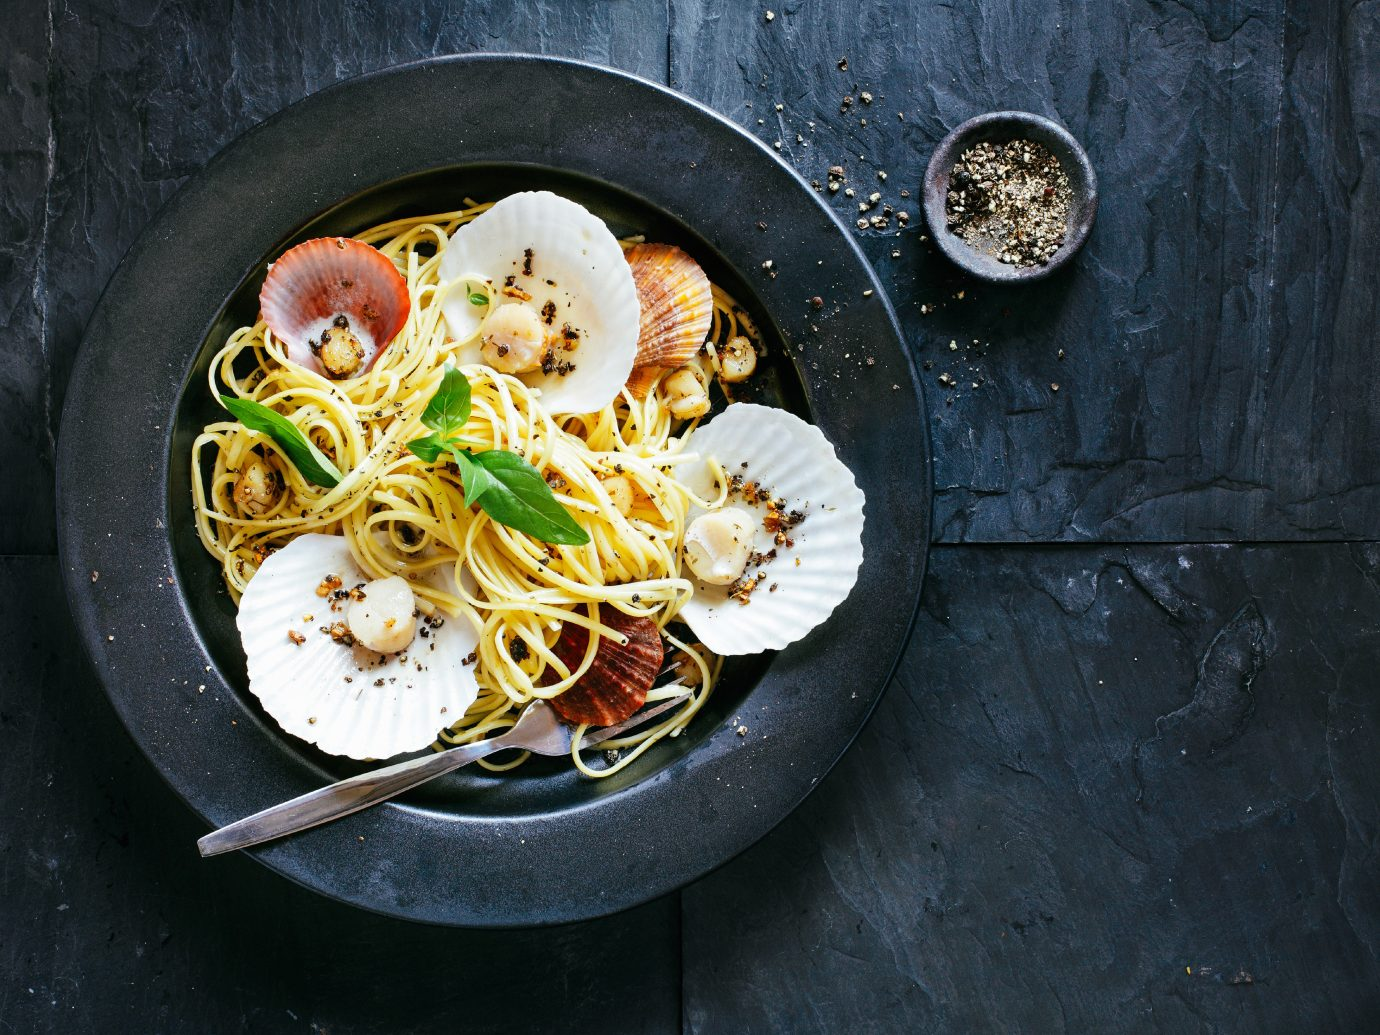 Florida Miami Trip Ideas Weekend Getaways dish food cuisine produce meal pan